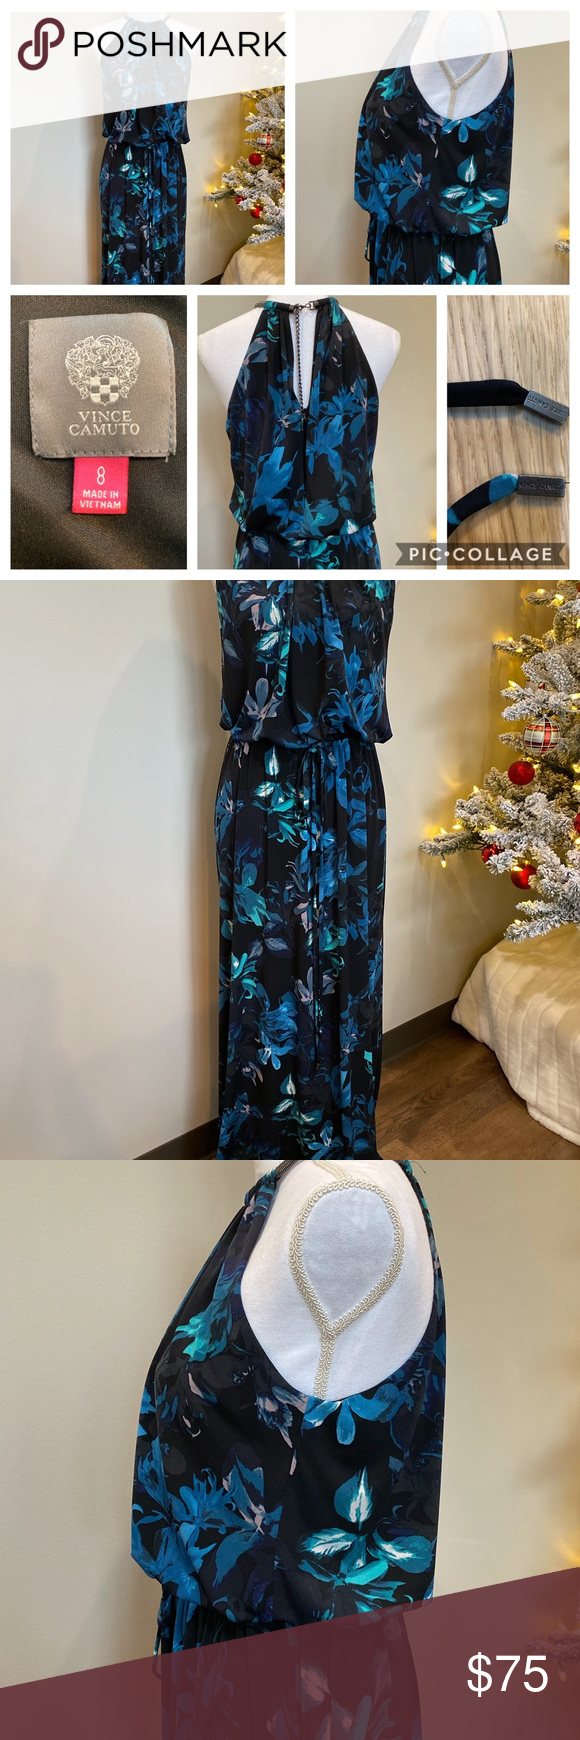 Gorgeous Vince Camuto Maxi Dress High Quality Maxi Dress Clothes Design Fashion Tips [ 1740 x 580 Pixel ]